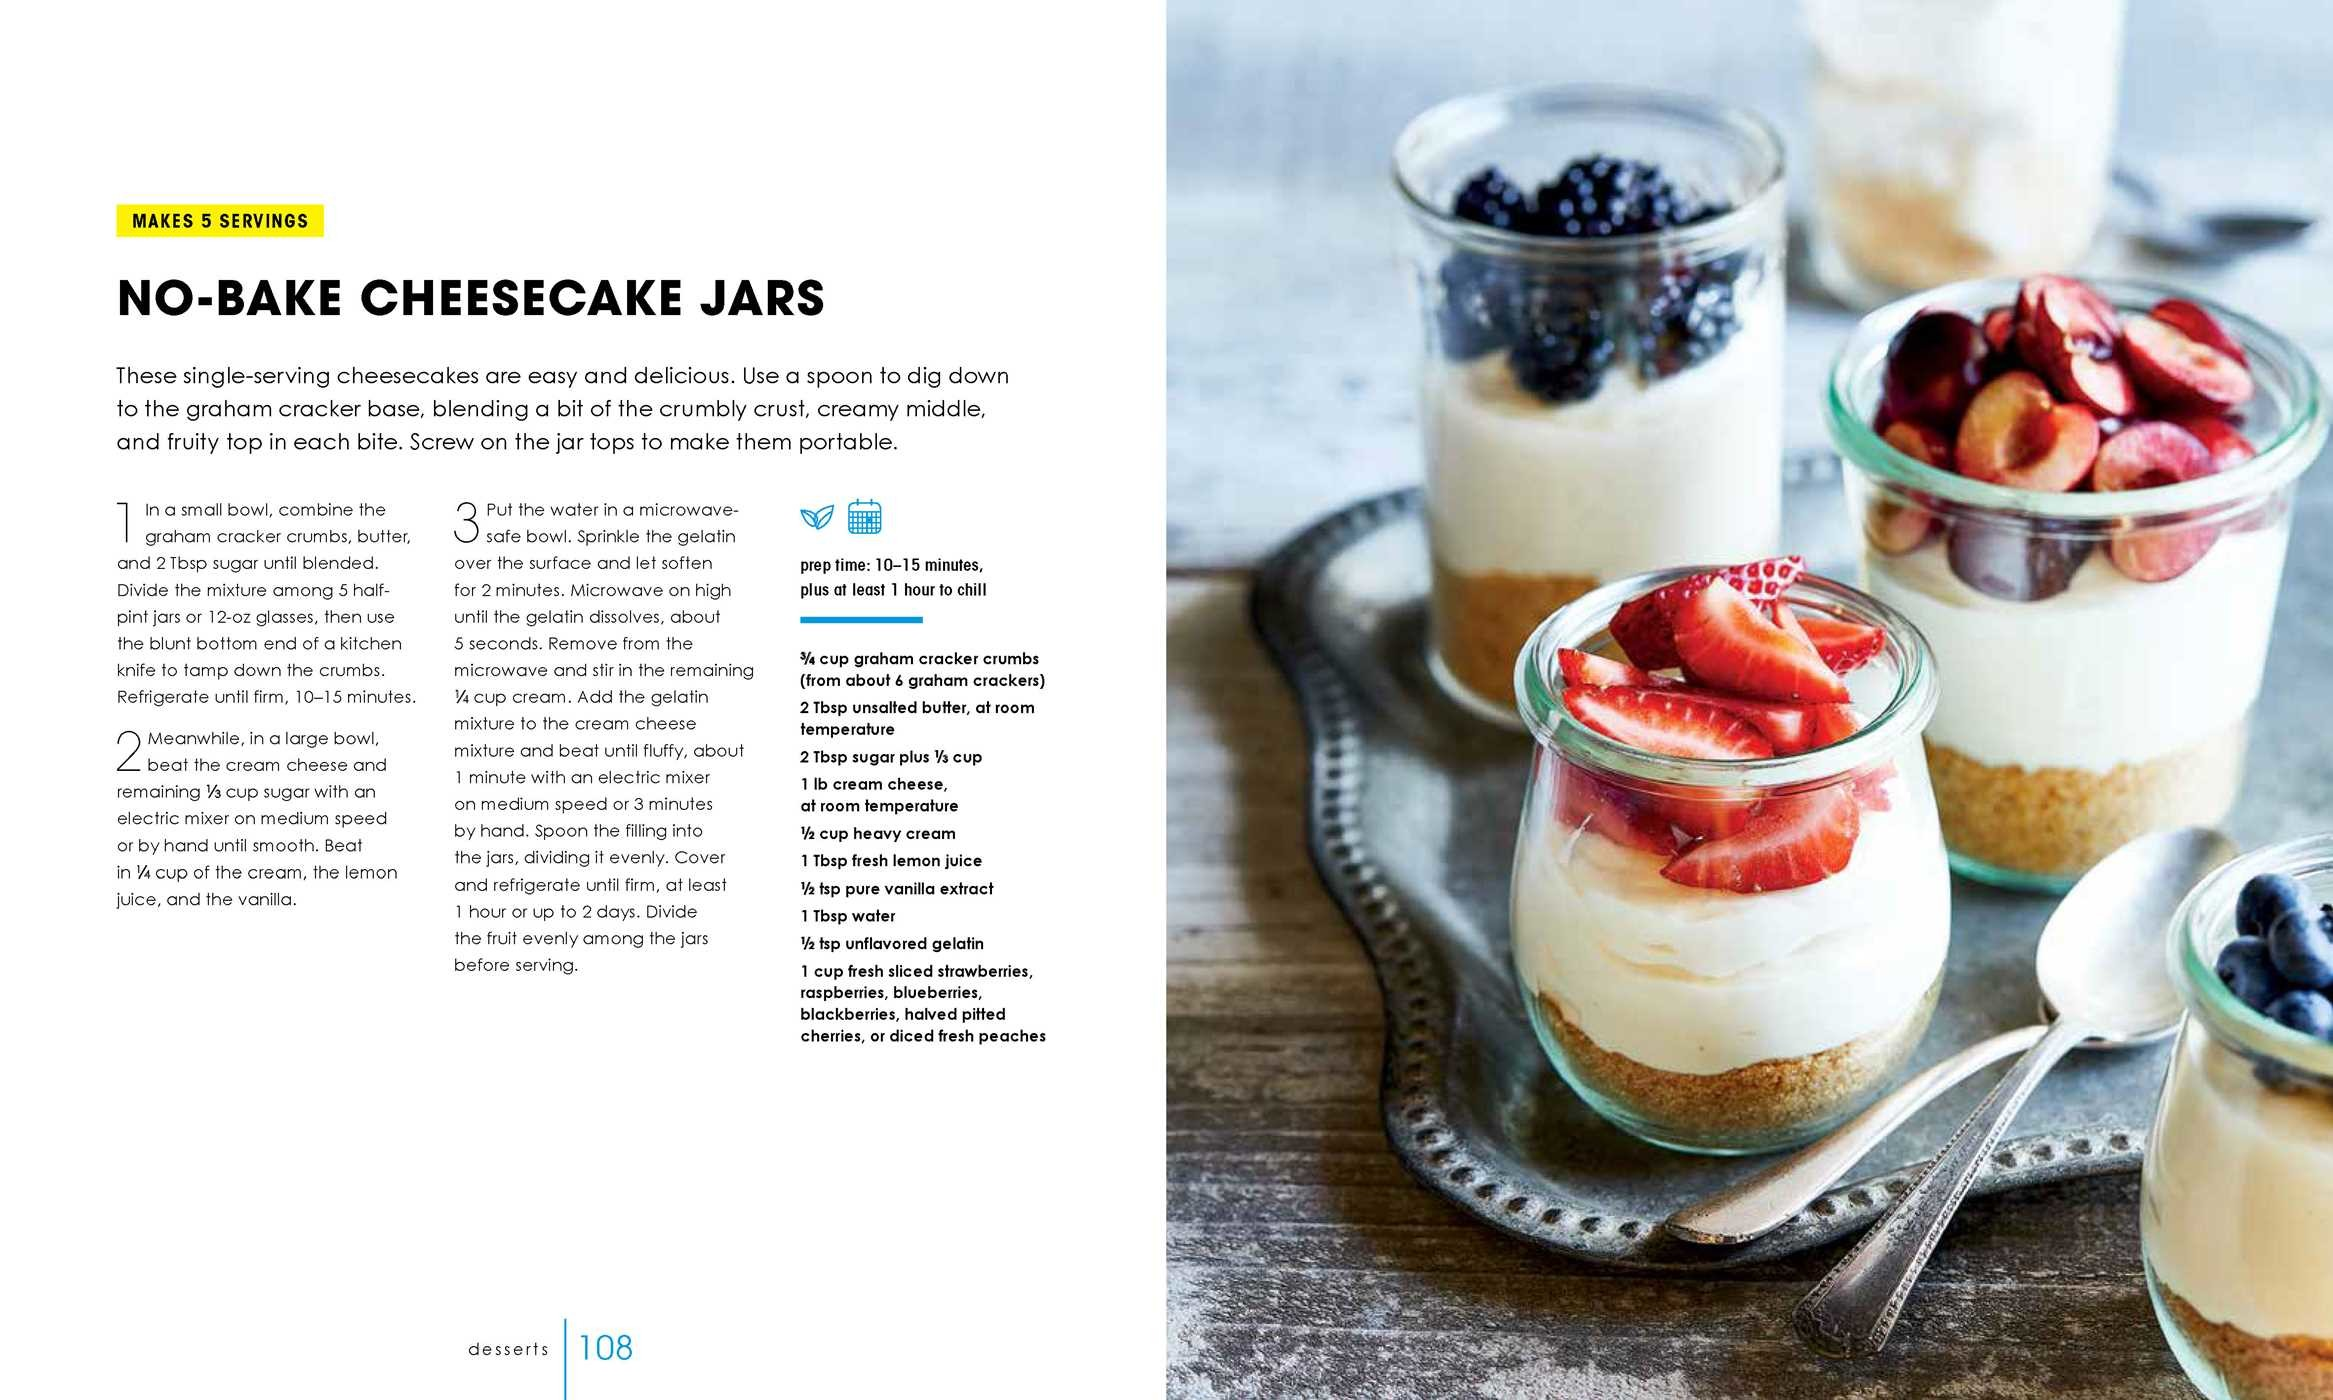 The college cookbook 9781681884363.in08